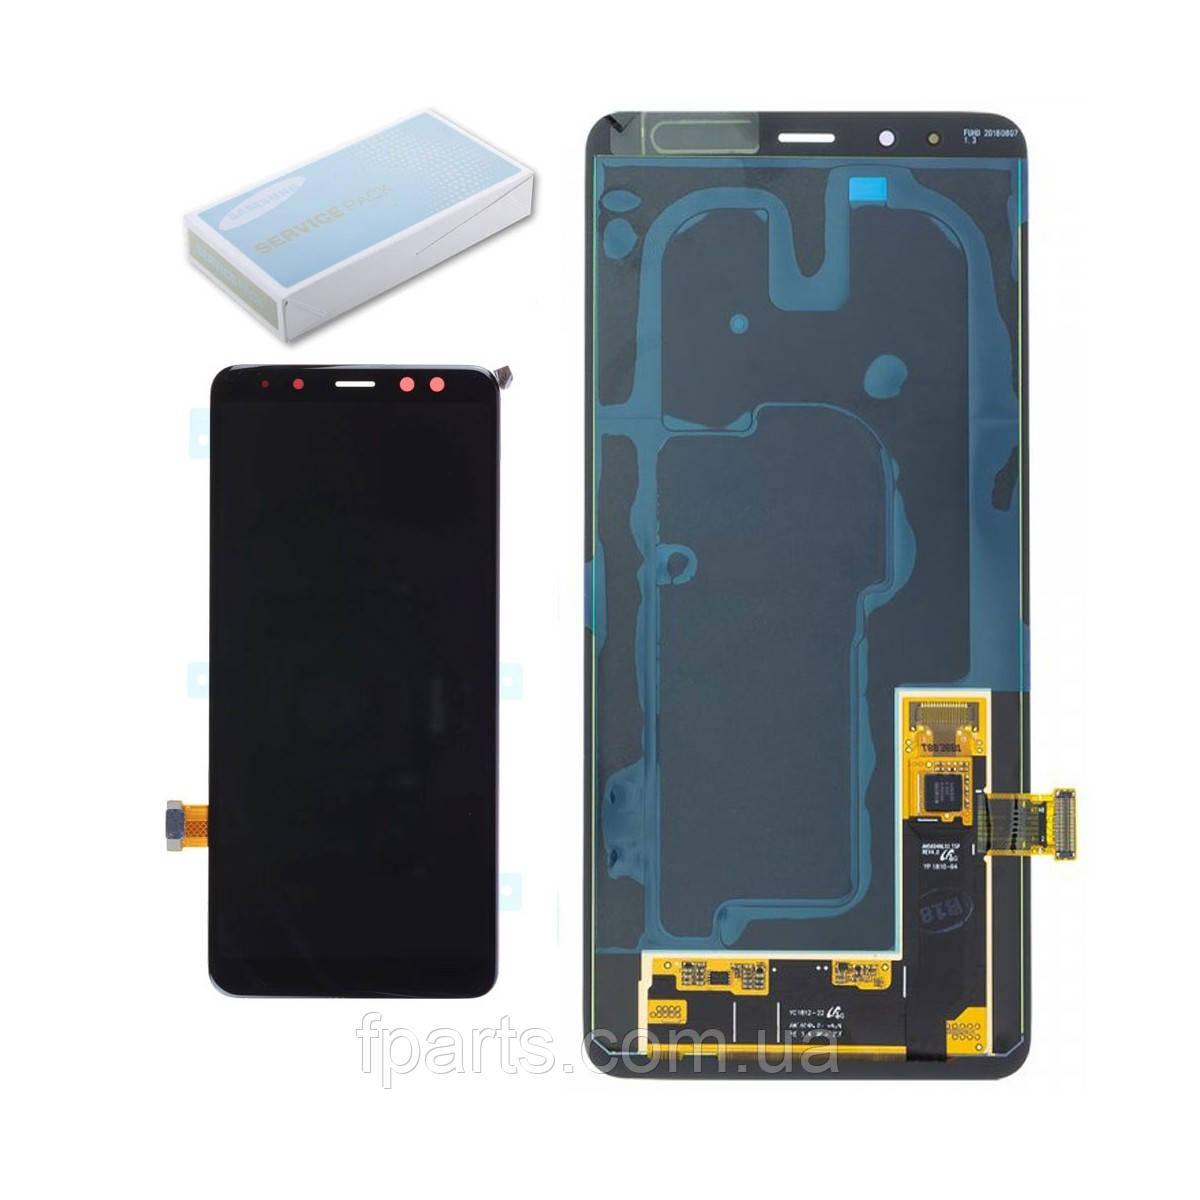 Дисплей Samsung A730F Galaxy A8 Plus (2018) с тачскрином (Black) GH97-21534A Original